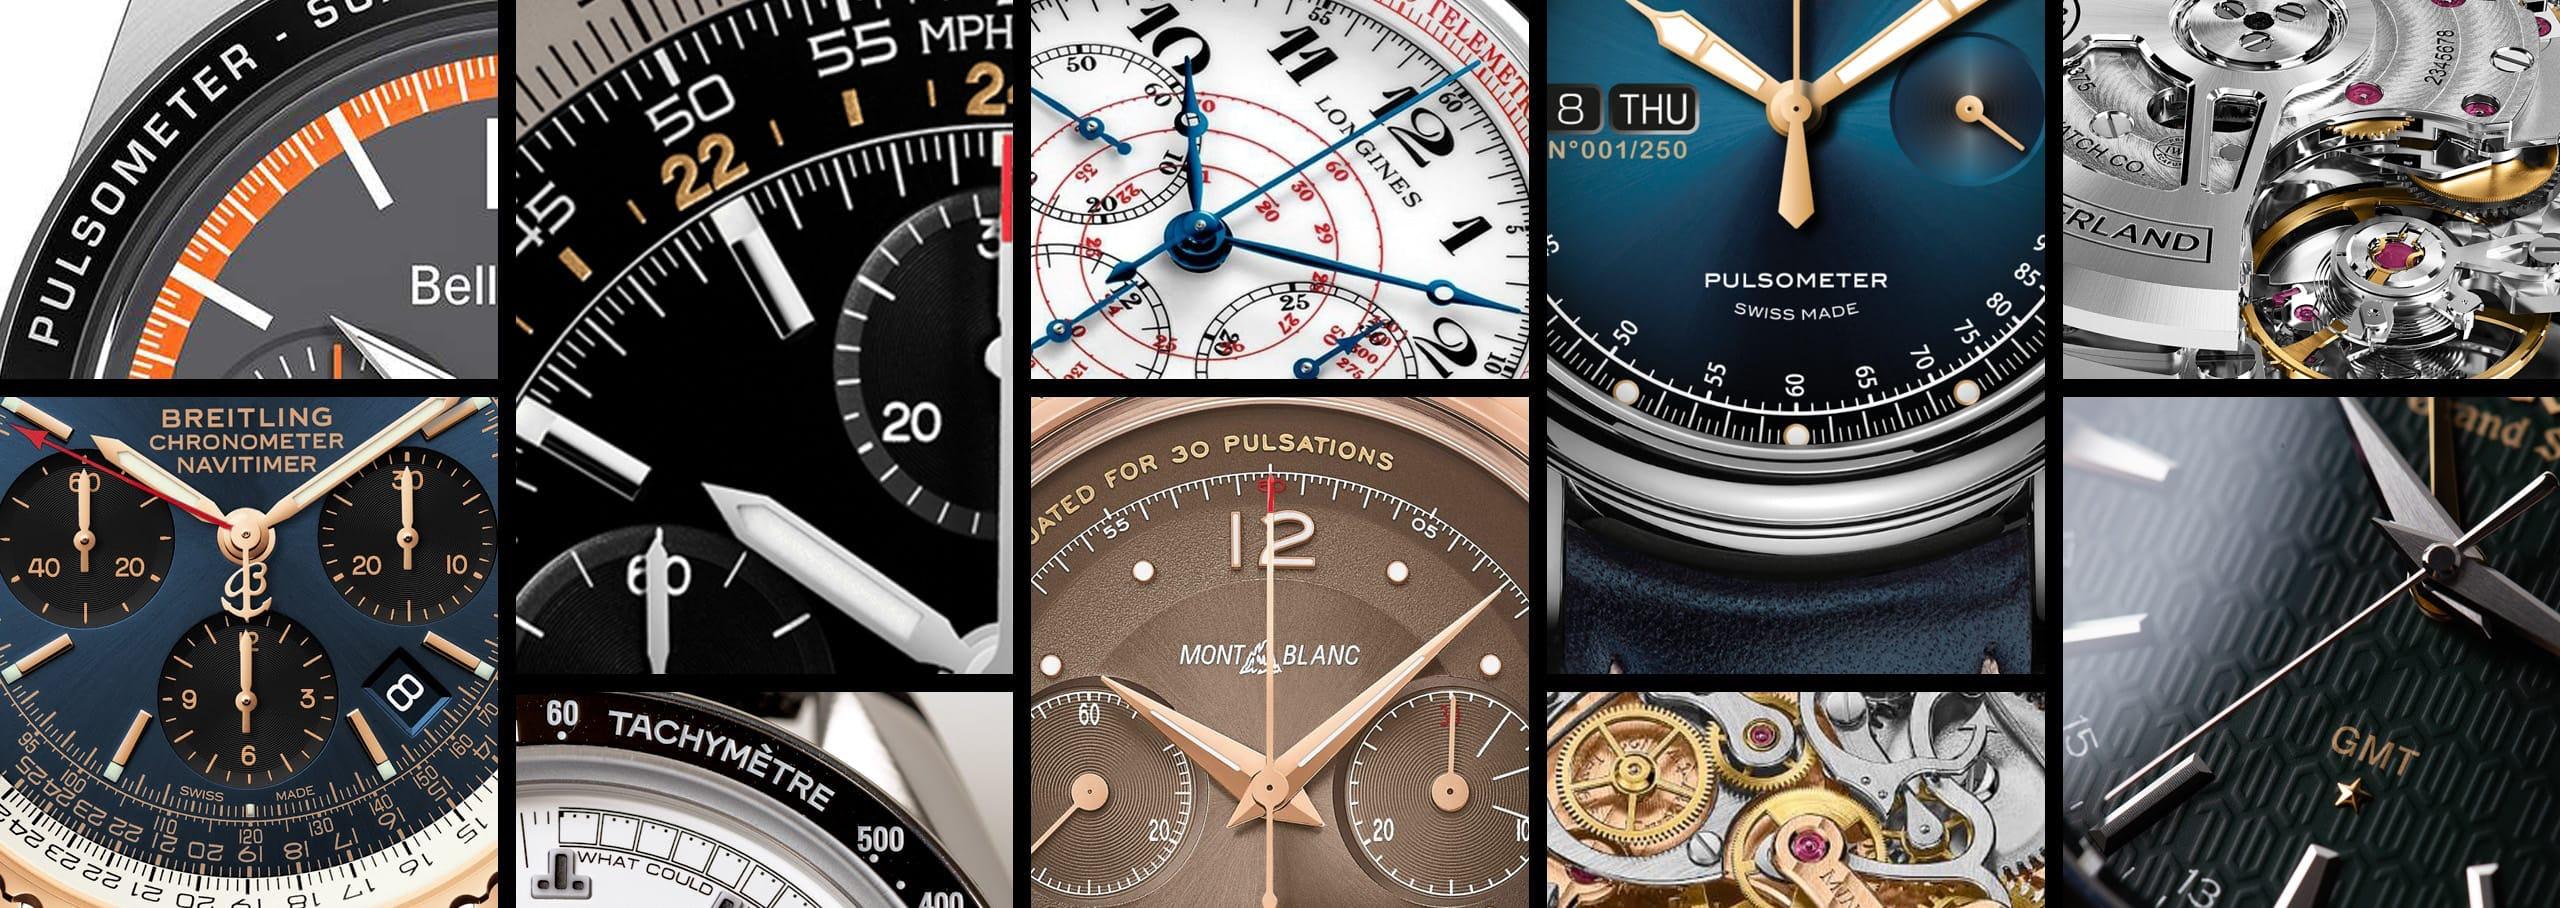 How to Read a Watch Bezel